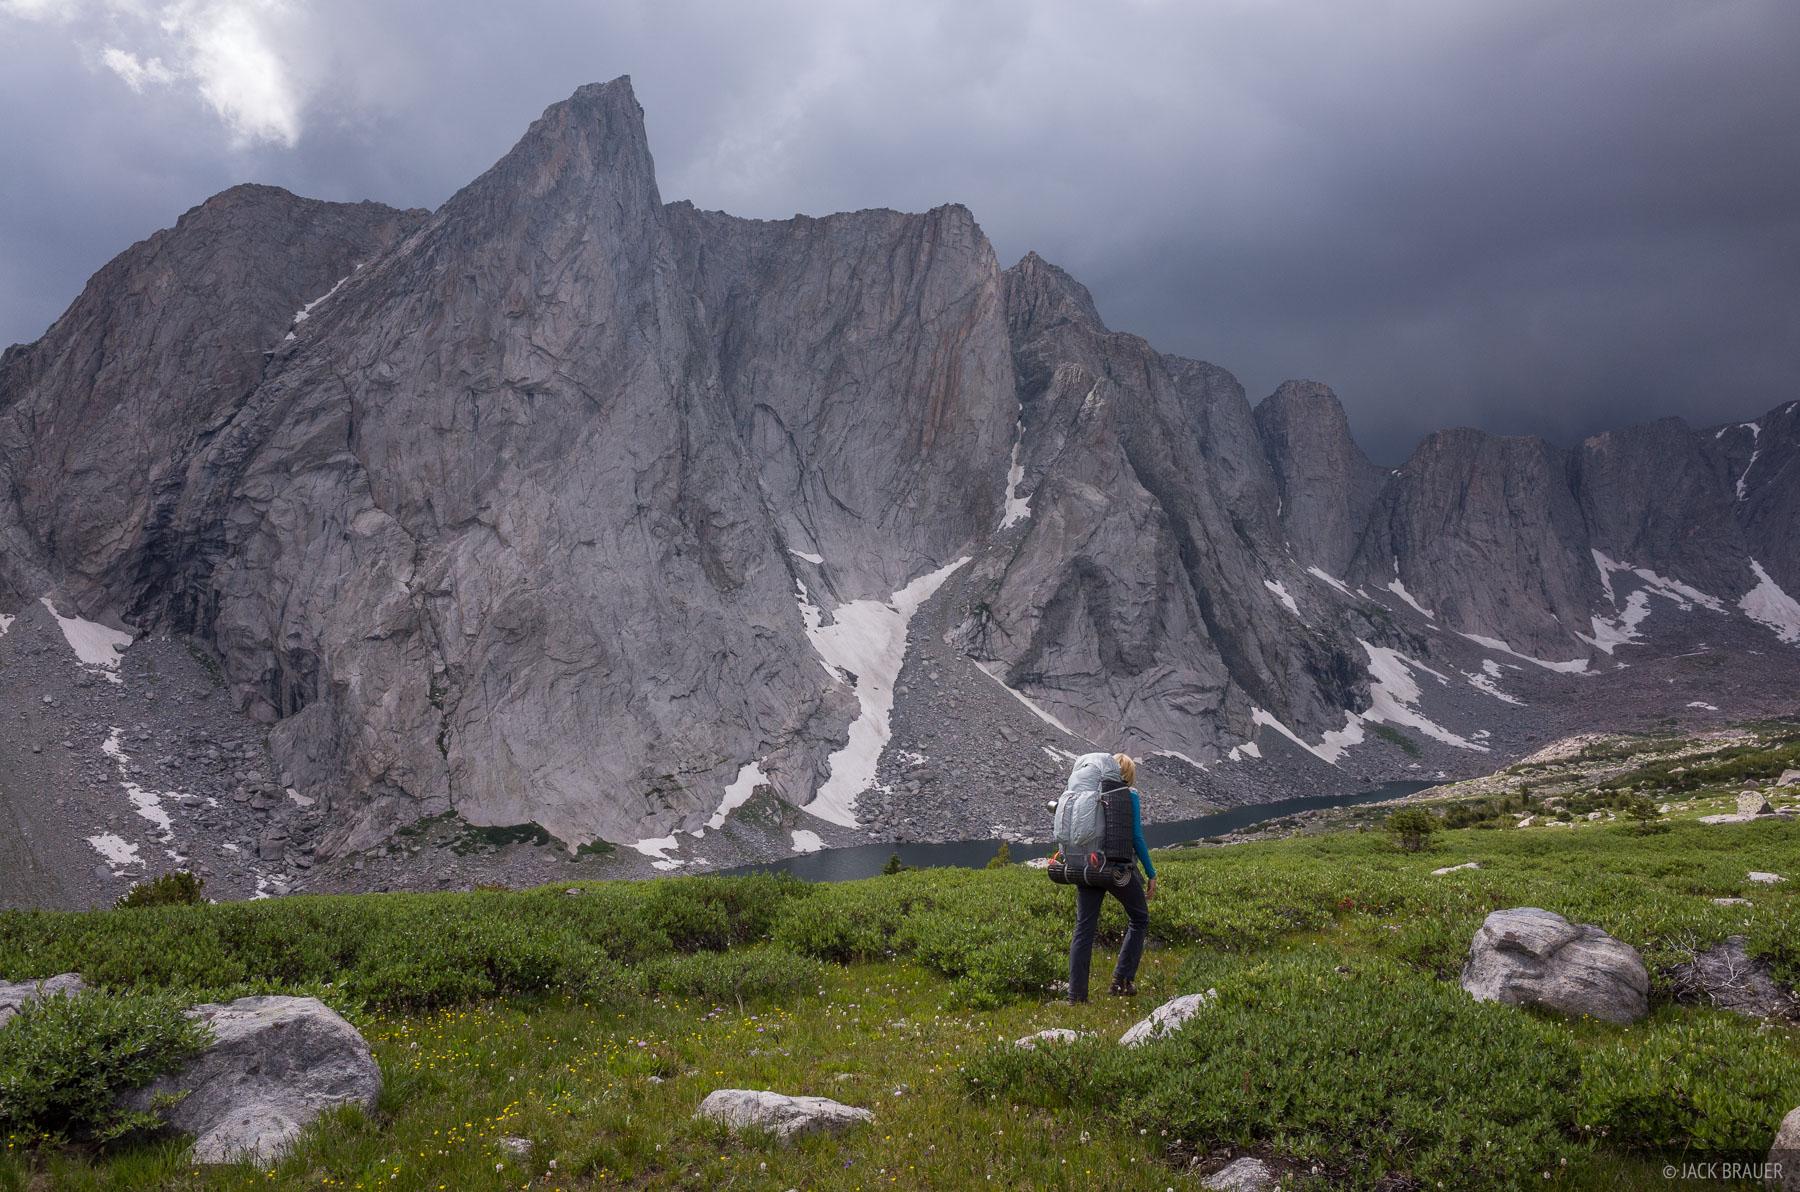 Hiking towards Ambush Peak as an ominous thunderstorm brews above.